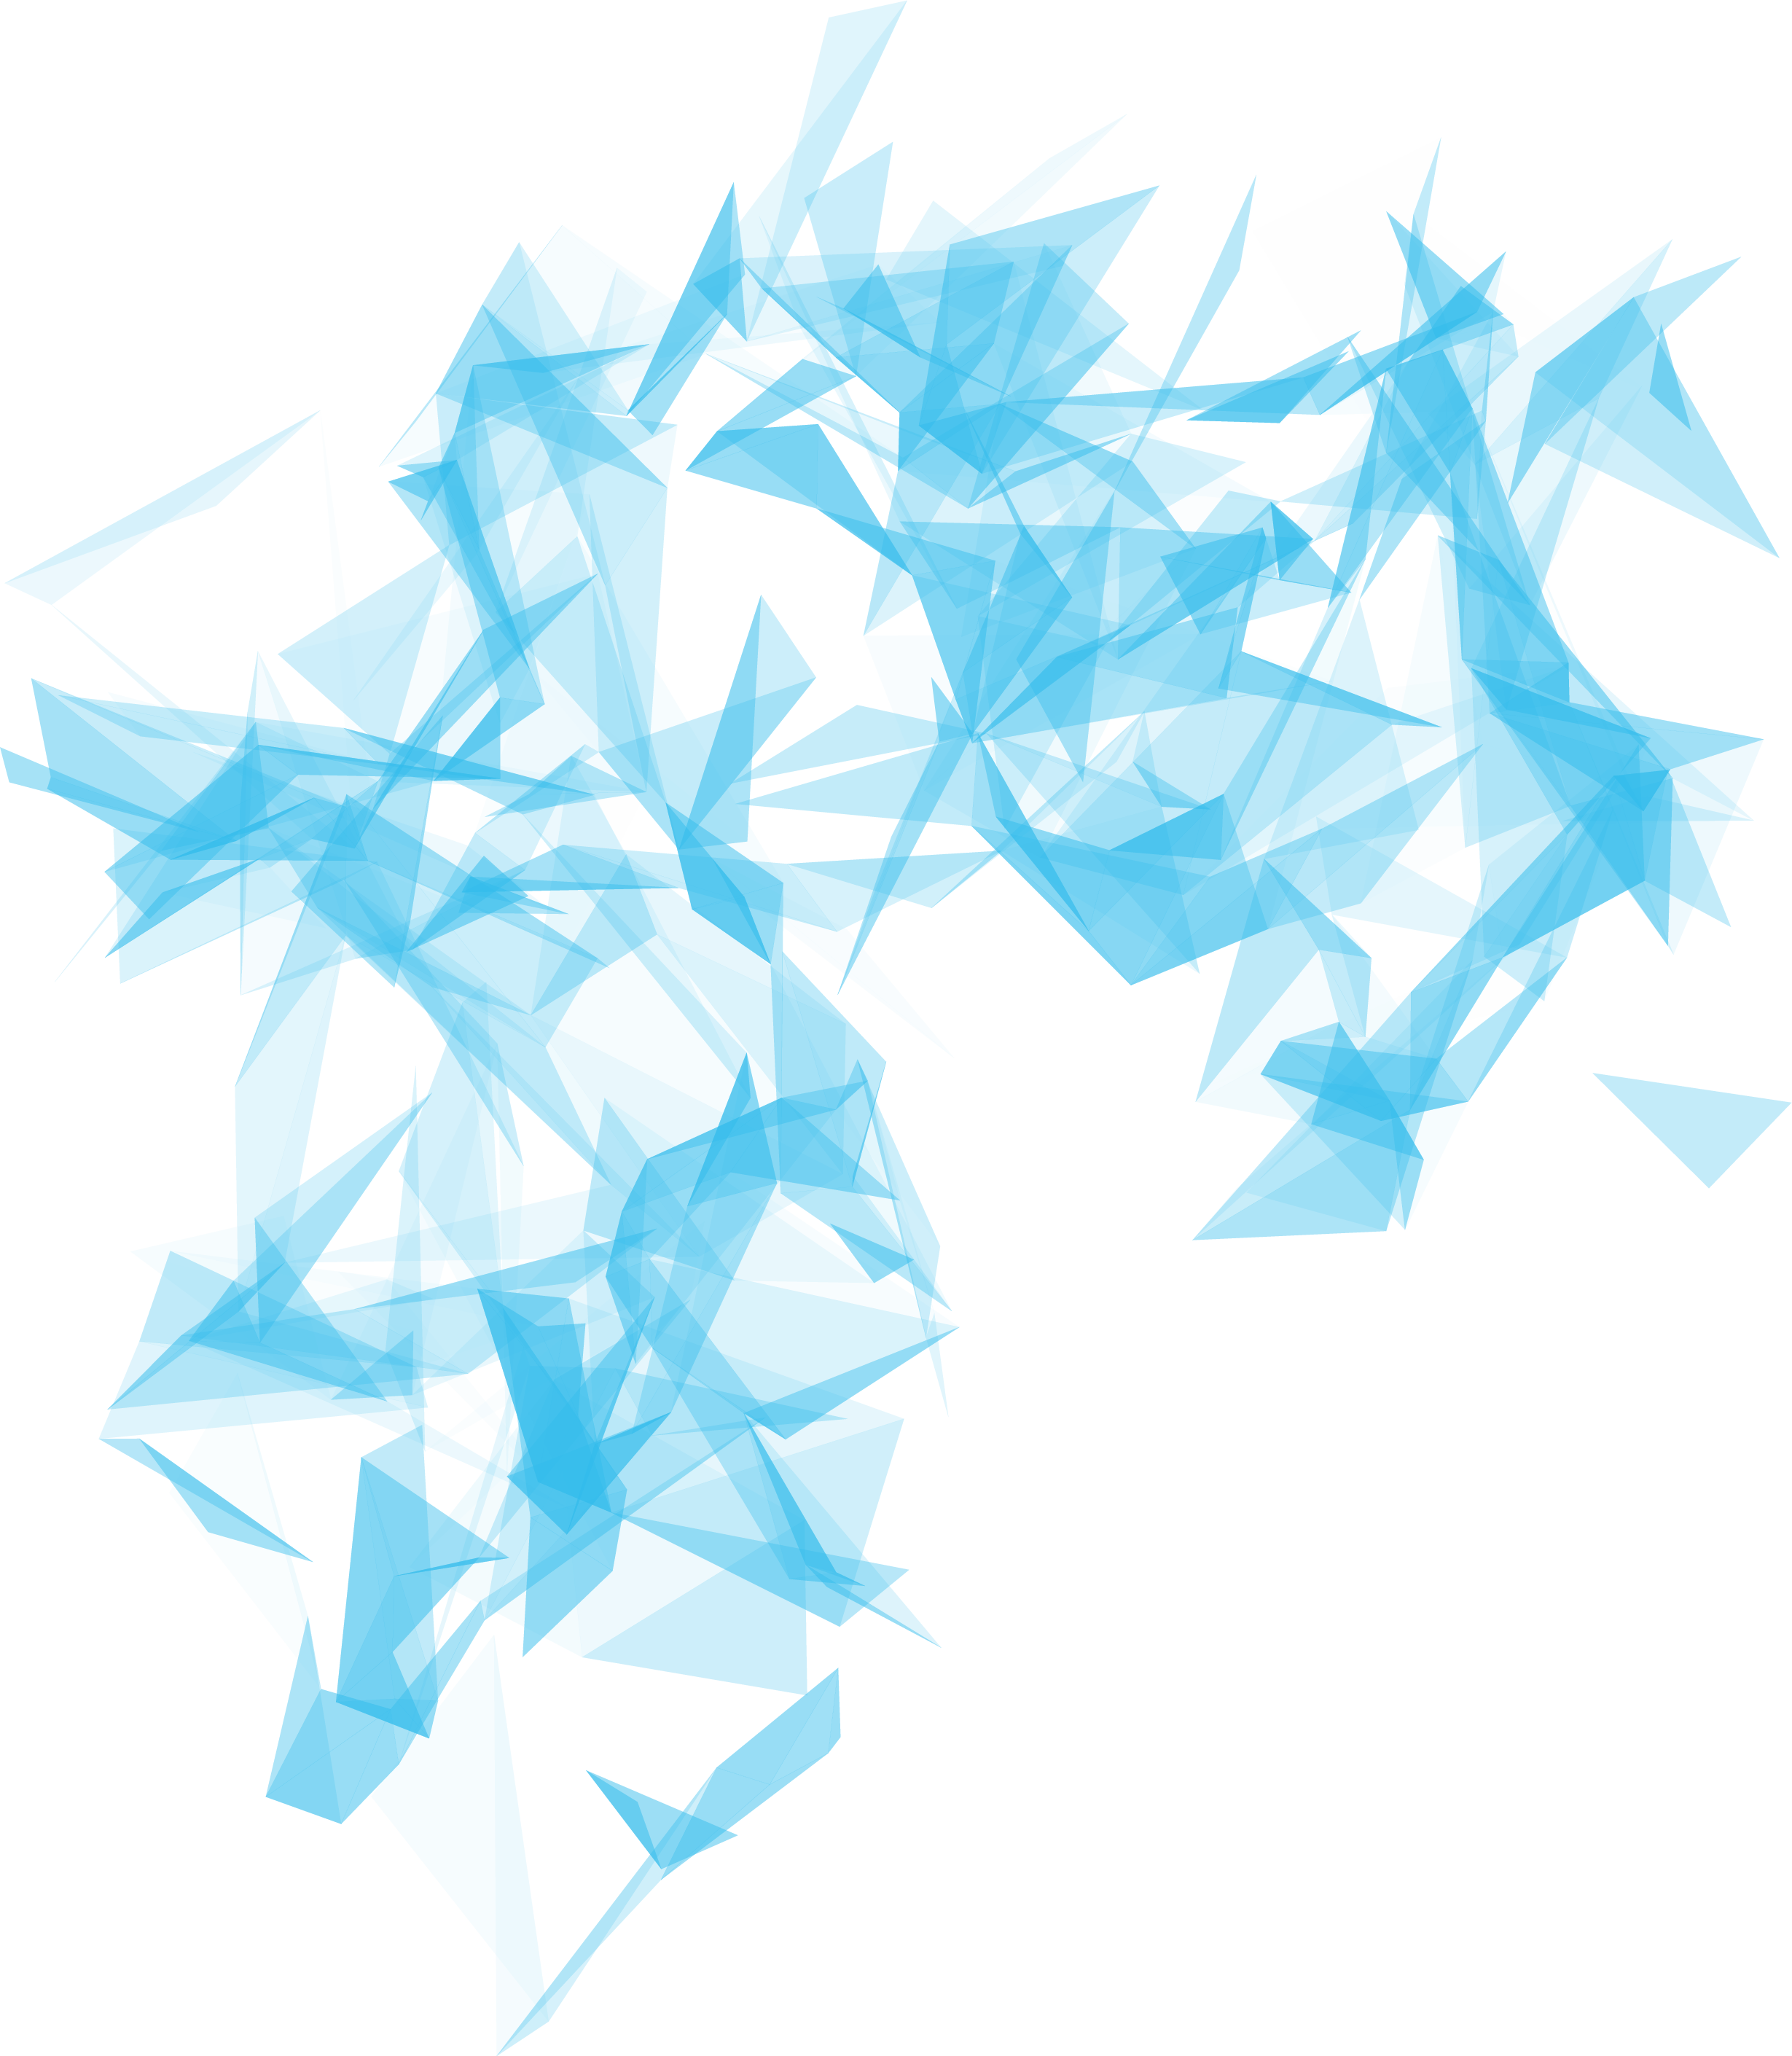 graphic black and white Blue Technology High tech Euclidean vector